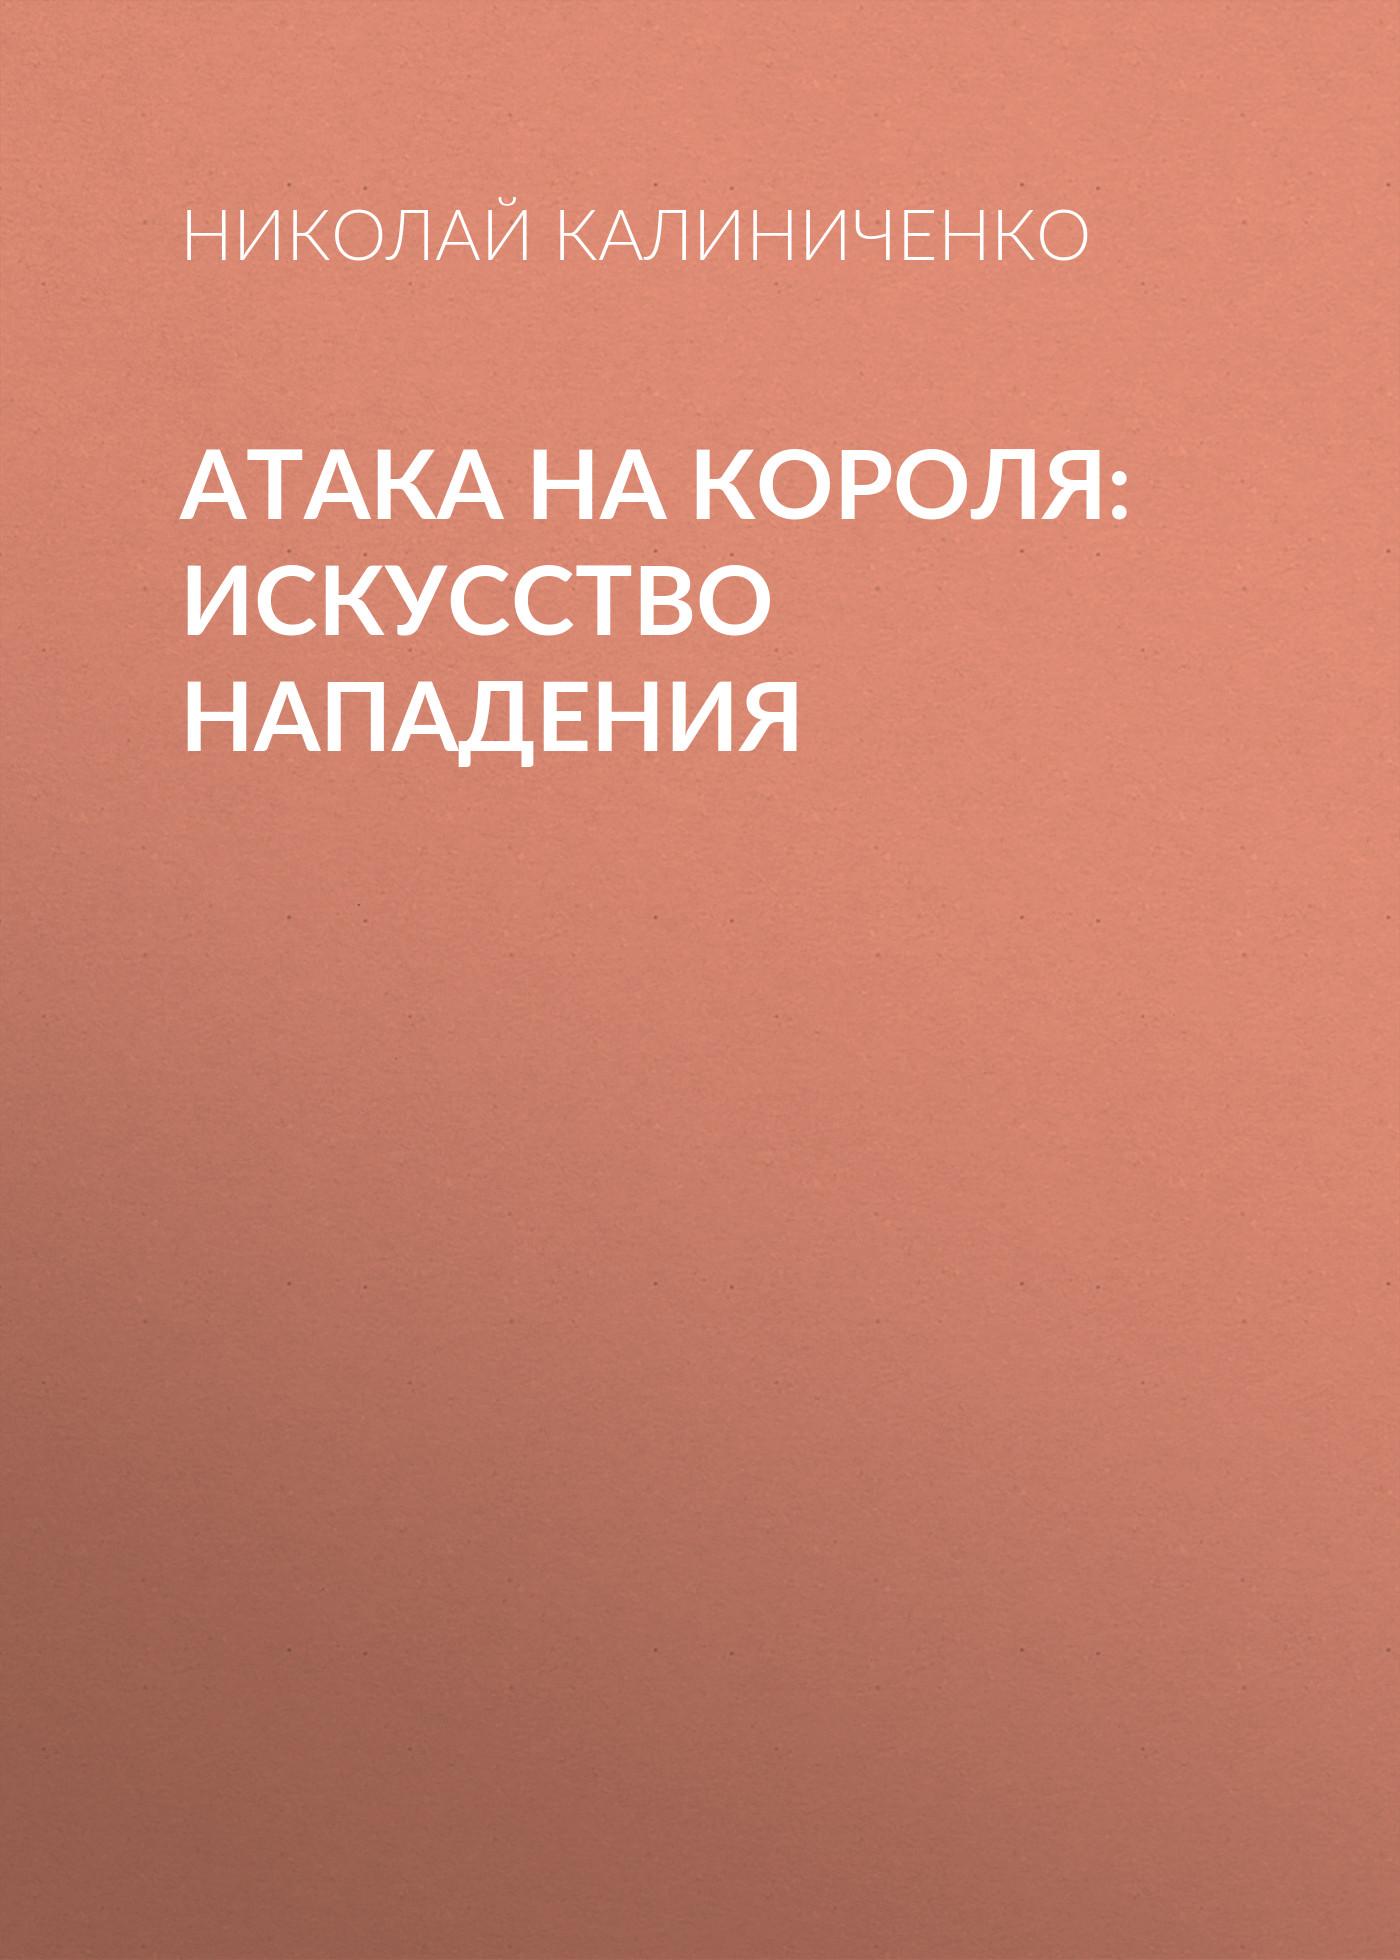 Николай Калиниченко Атака на короля. Искусство нападения костюм шахматного короля 30